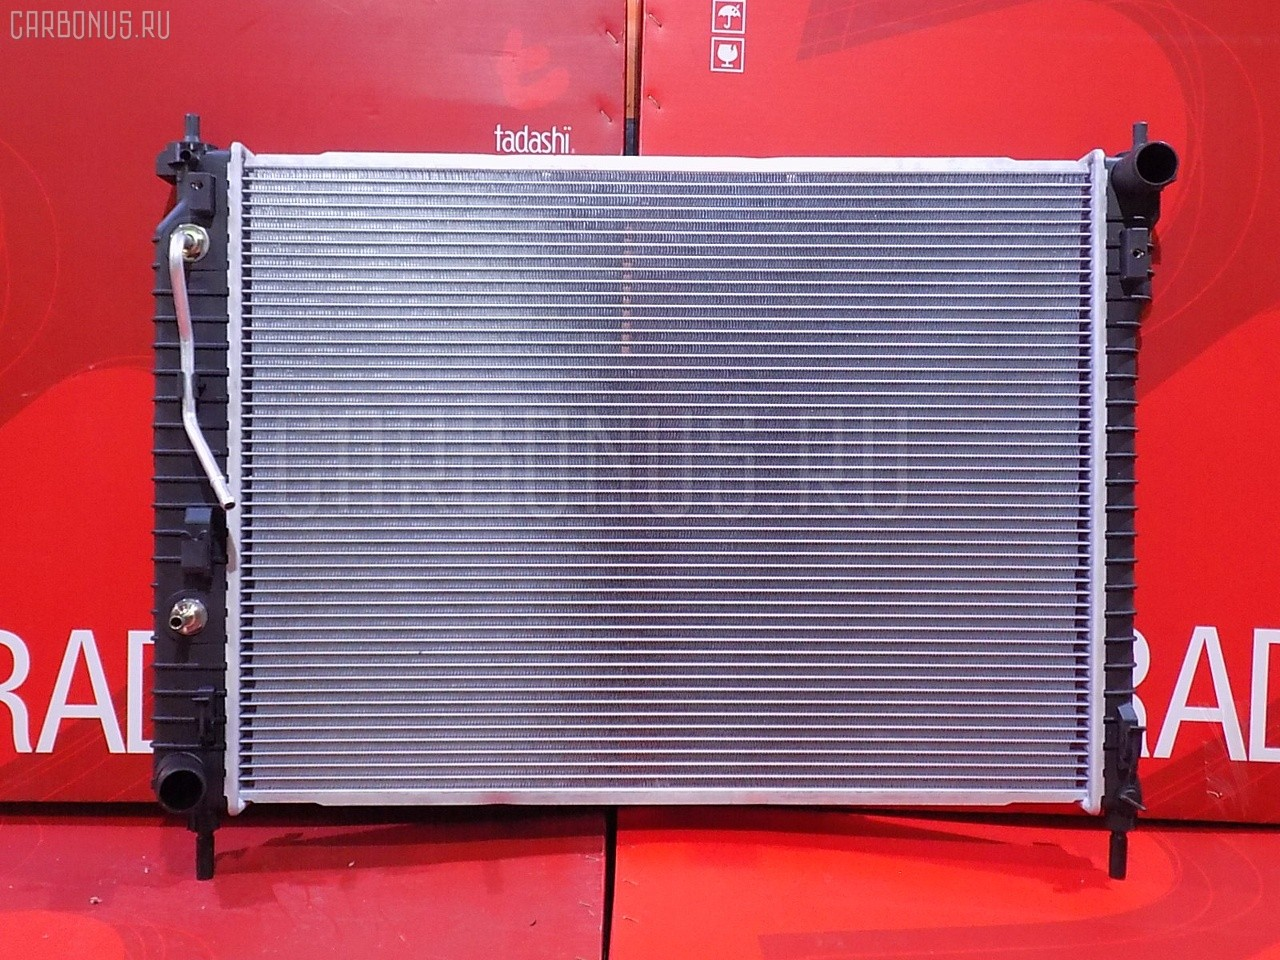 Радиатор ДВС TADASHI TD-036-0162 на Opel Antara A Фото 1